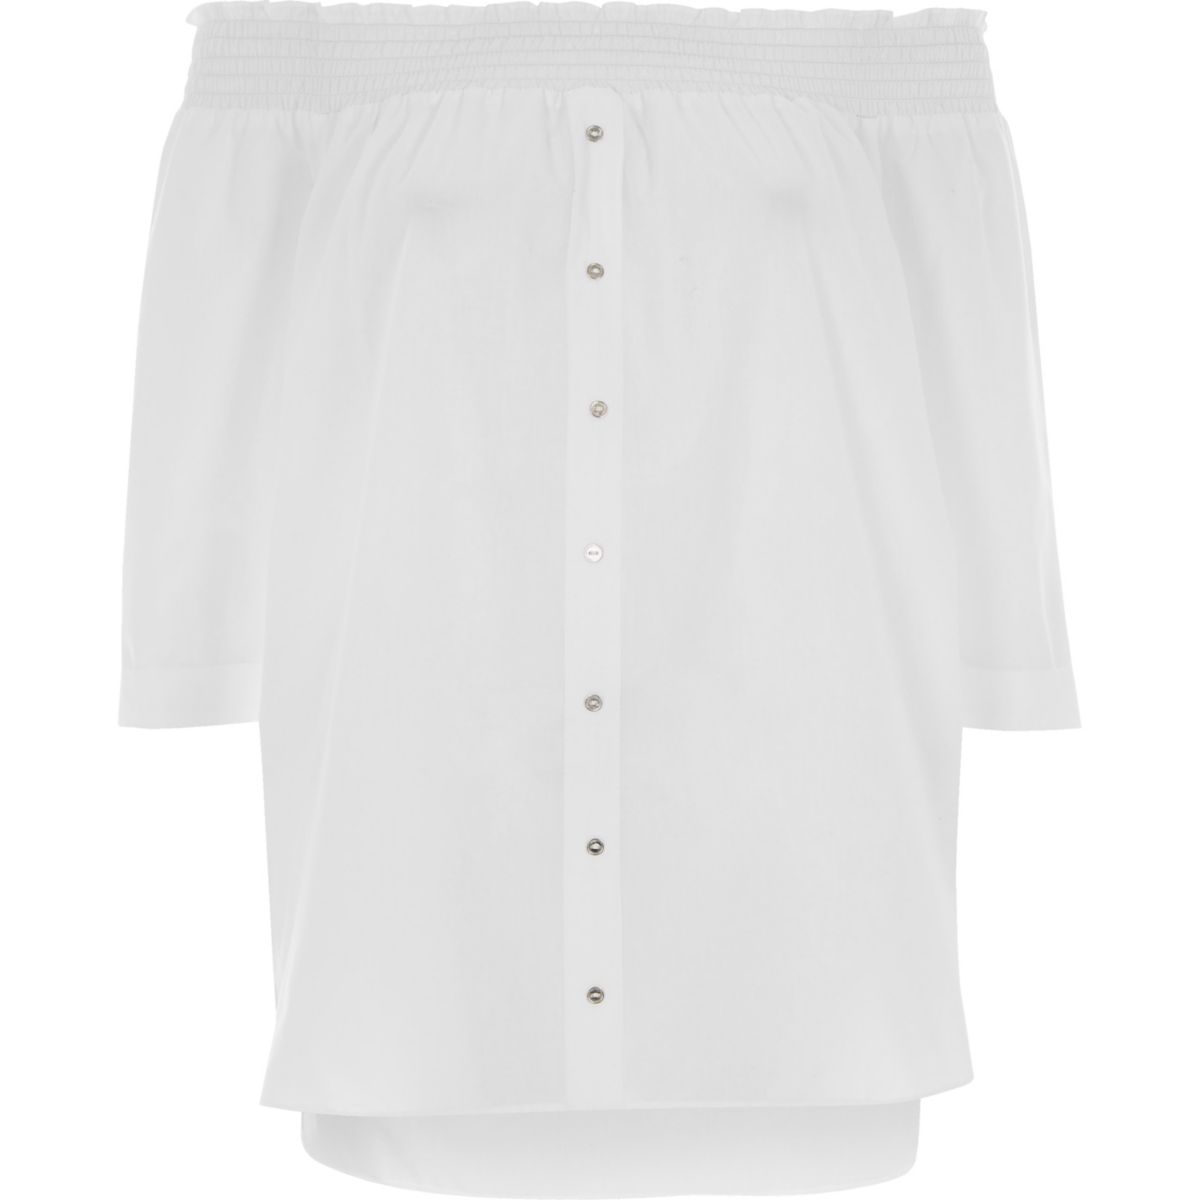 White long sleeve bardot shirt